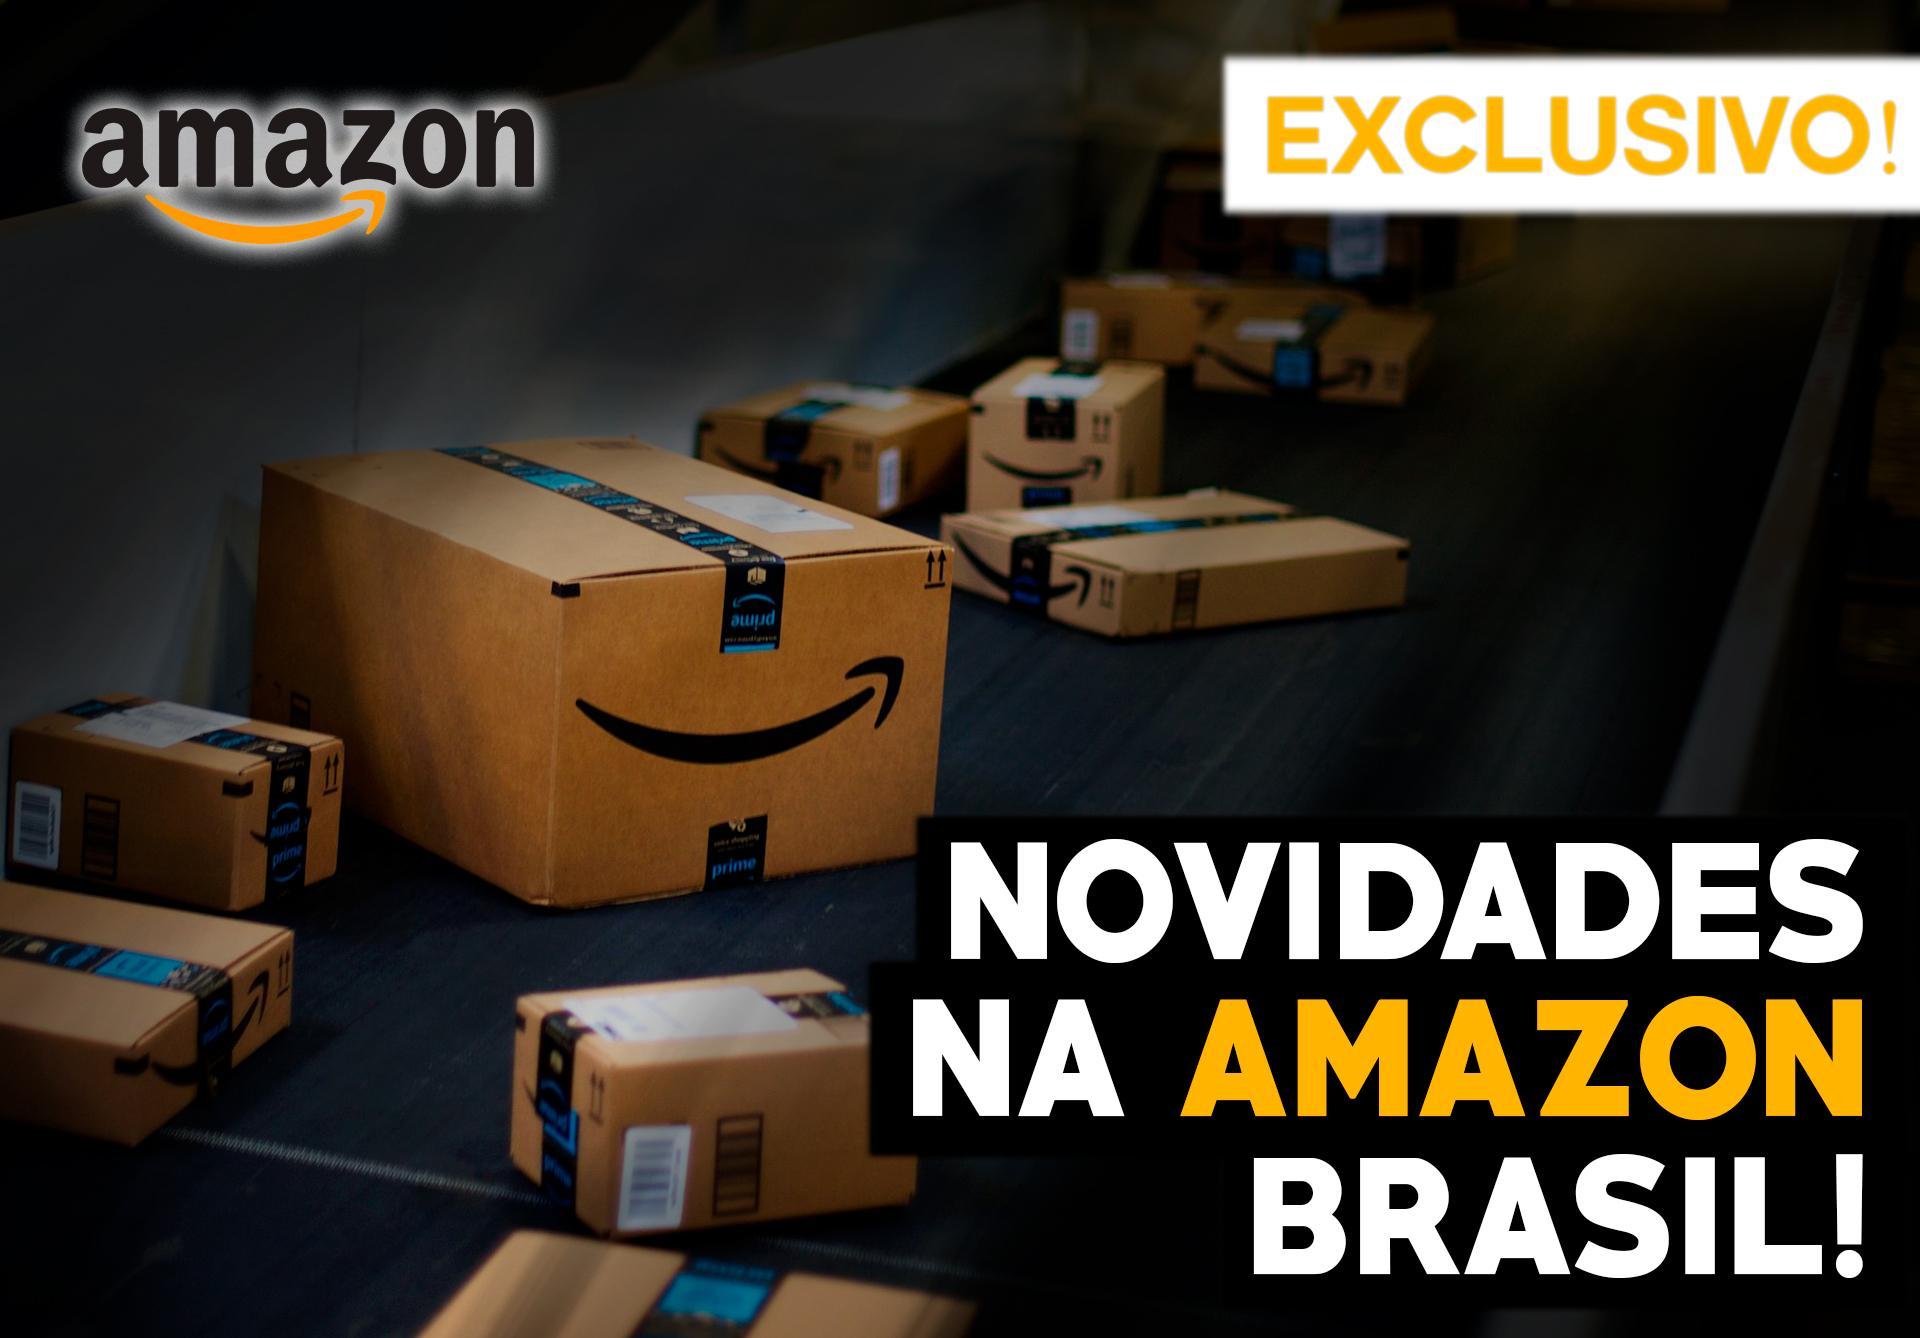 EXCLUSIVO! NOVIDADES NA AMAZON MARKETPLACE 2019